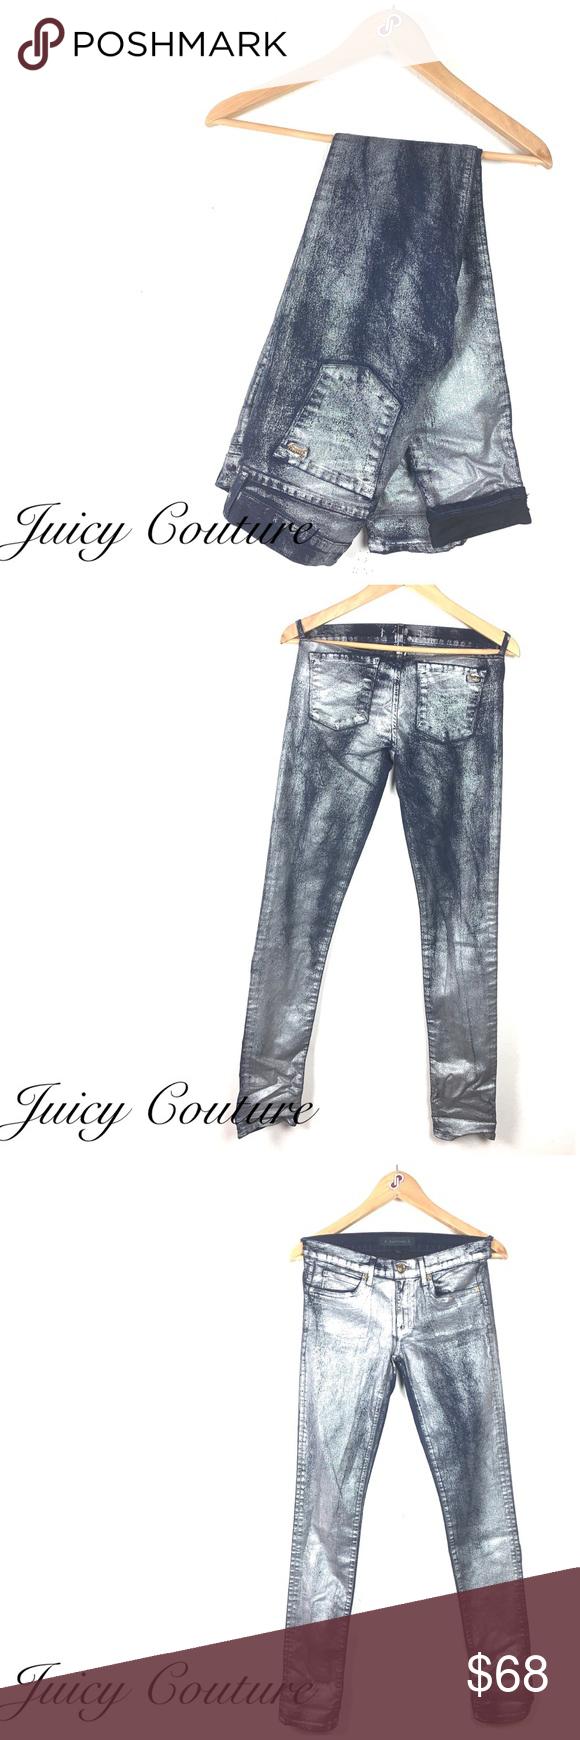 e9819fa3 Juicy Couture Silver Metallic Skinny Jeans Size 27 Juicy Couture Silver  Metallic Skinny Jeans Size 27